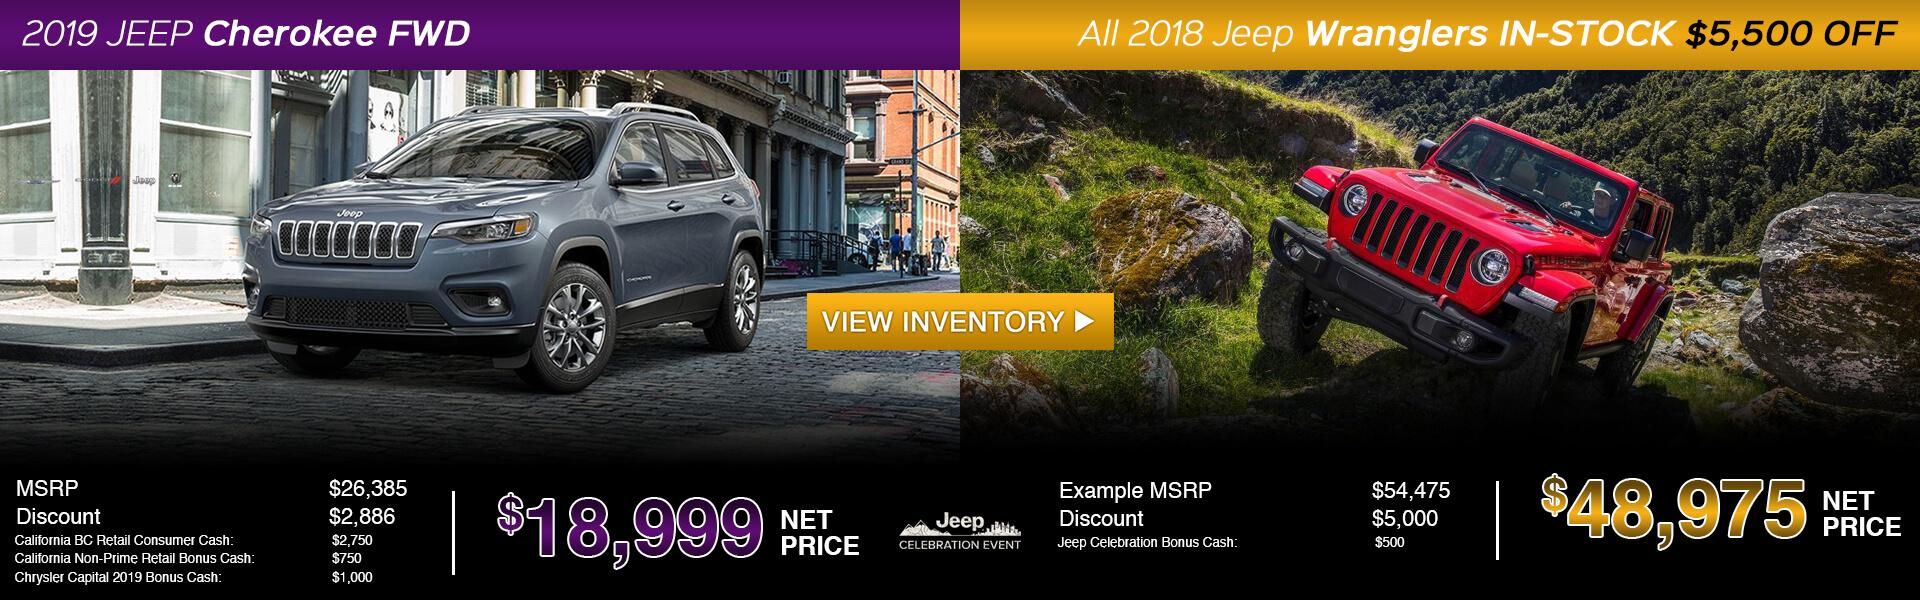 2019 Jeep Cherokee/2018 Jeep Wrangler